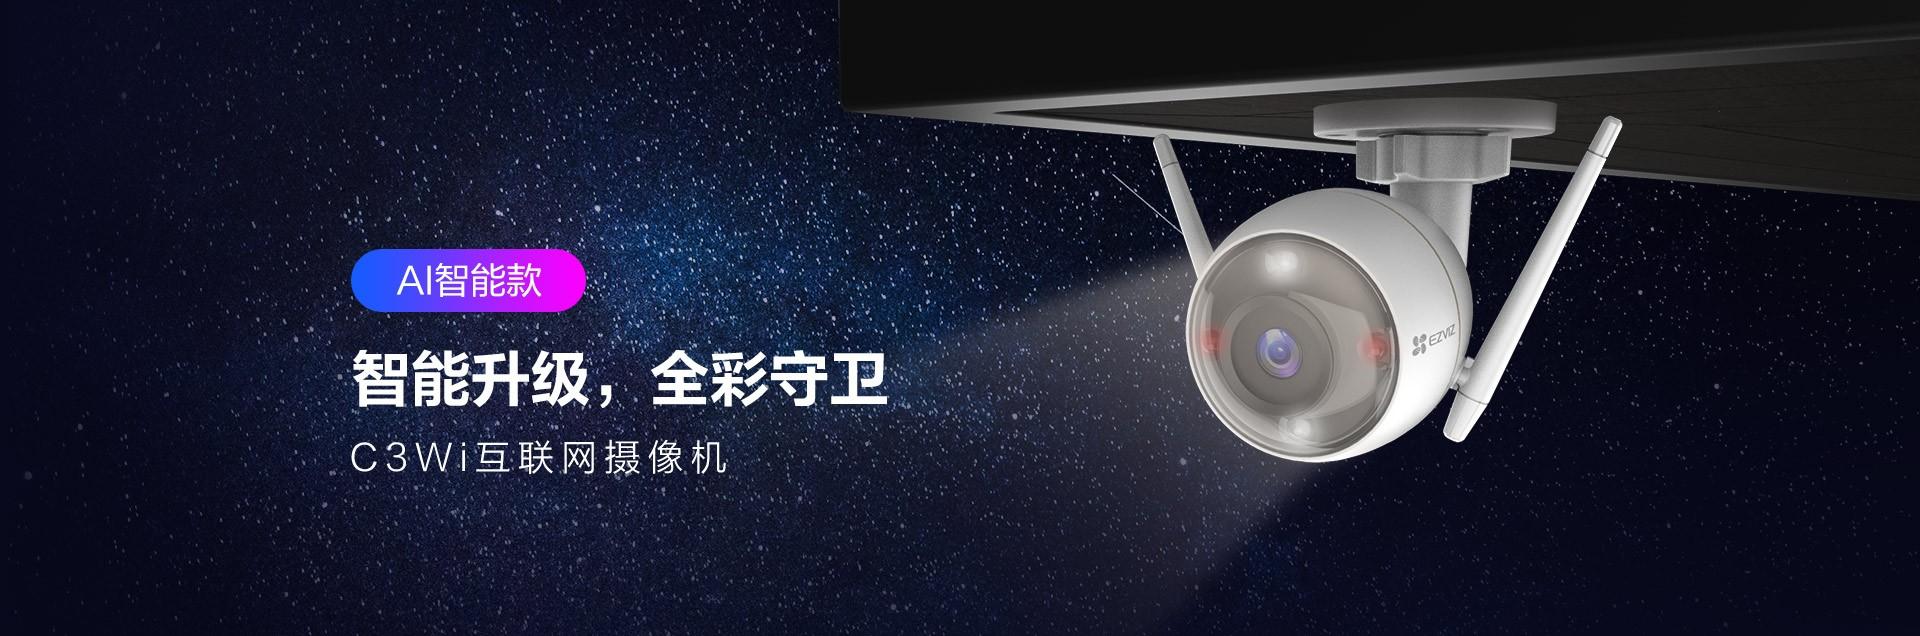 C3wi-Ai智能款-web_01.jpg